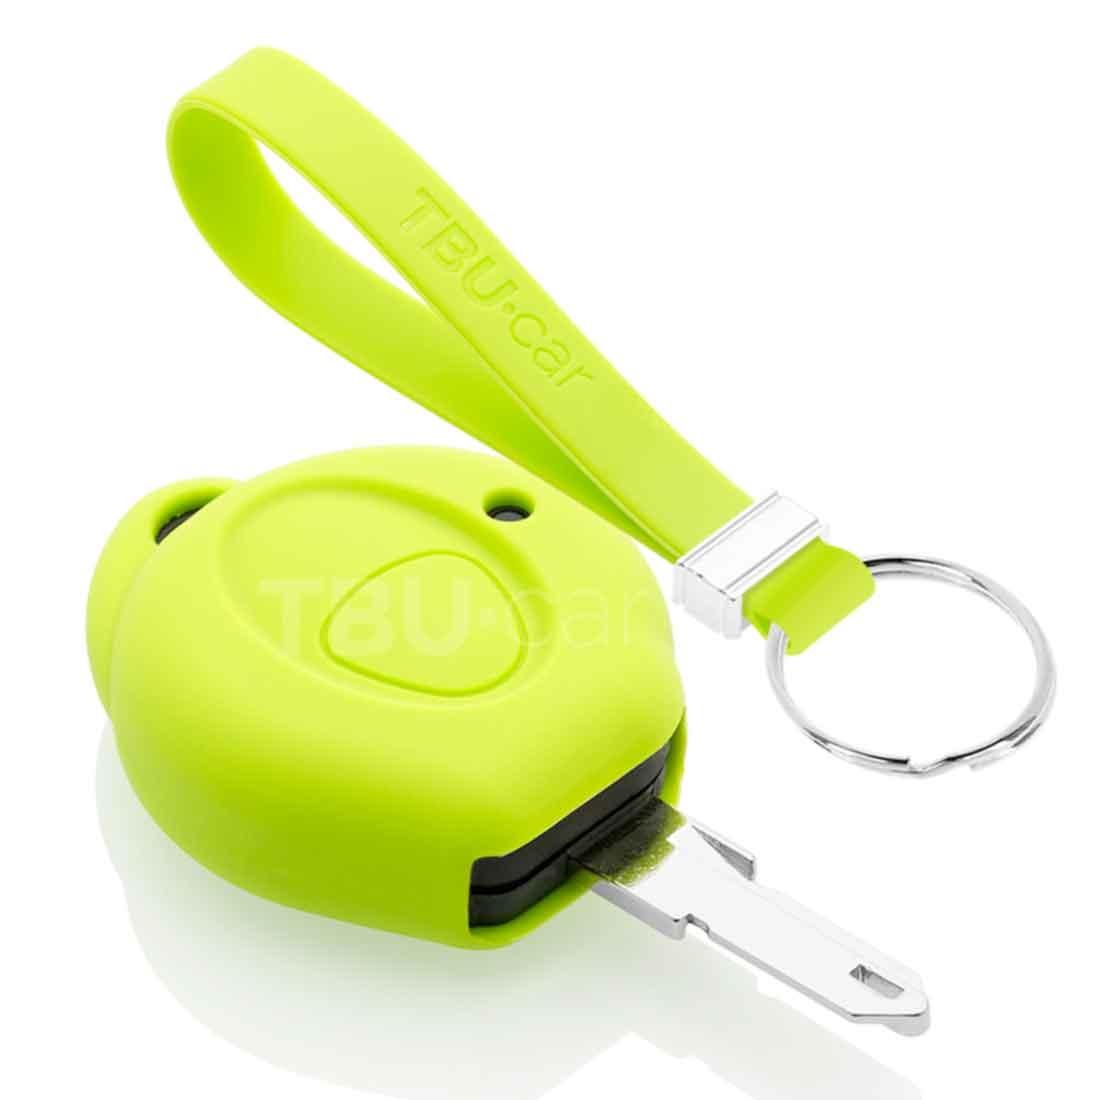 TBU car TBU car Autoschlüssel Hülle kompatibel mit Peugeot 1 Taste - Schutzhülle aus Silikon - Auto Schlüsselhülle Cover in Lindgrün